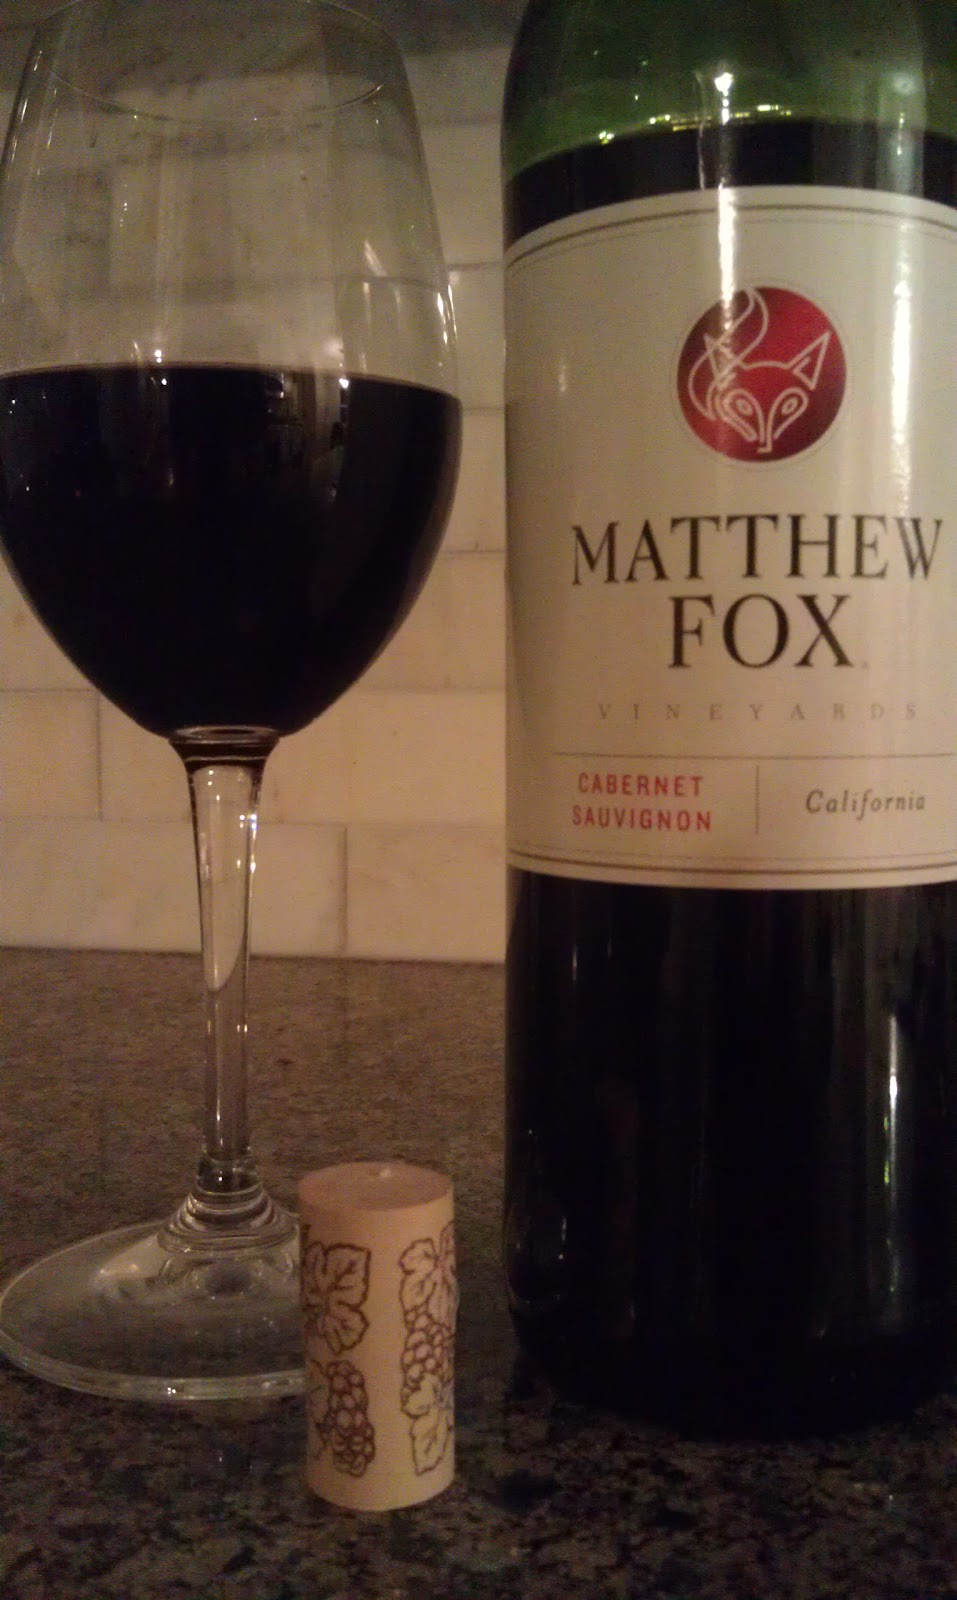 Matthew Fox cabernet sauvignon review